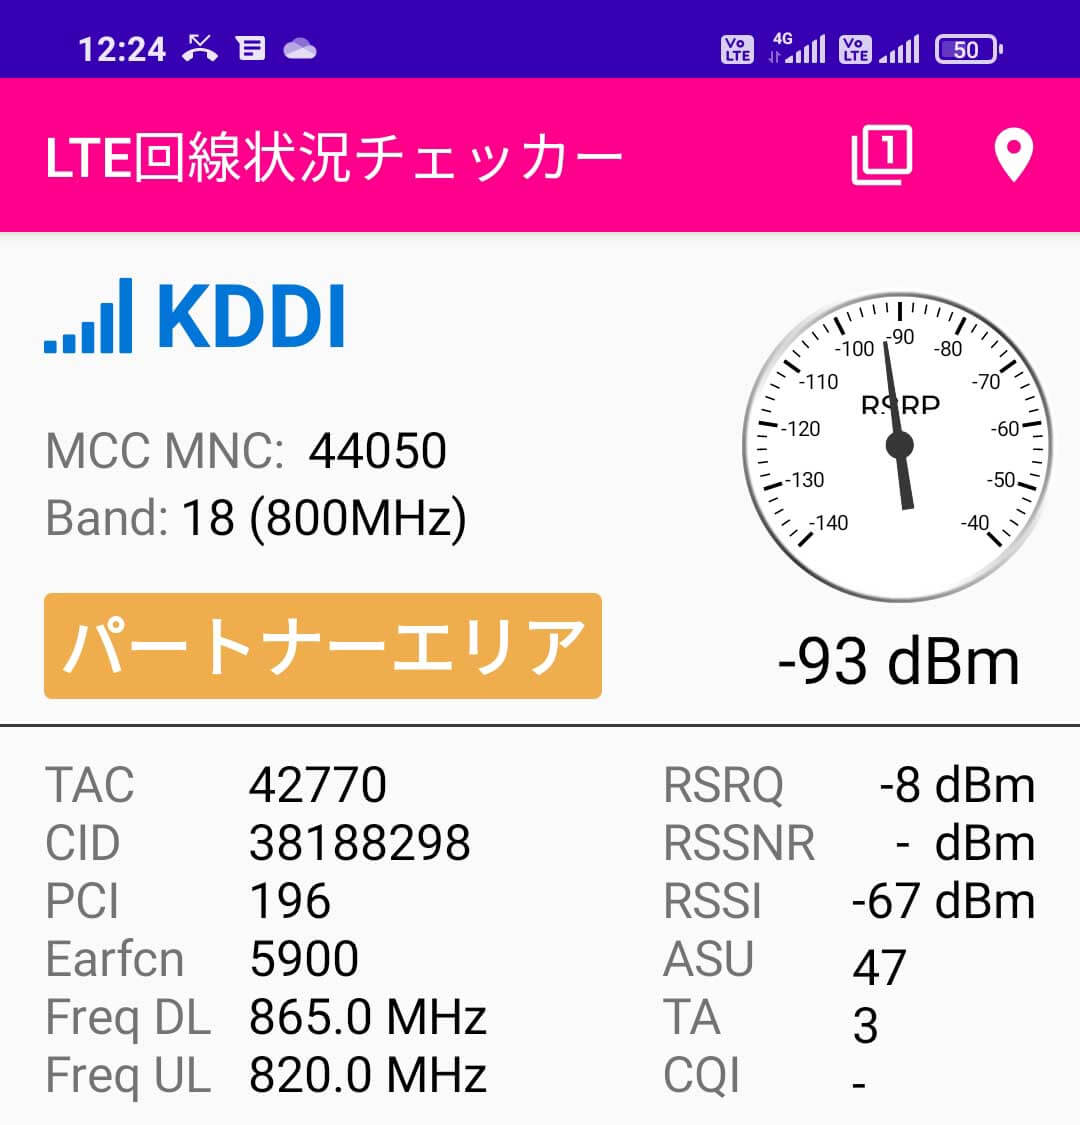 Redmi 9Tでは楽天モバイルのパートナー回線バンド18が利用可能